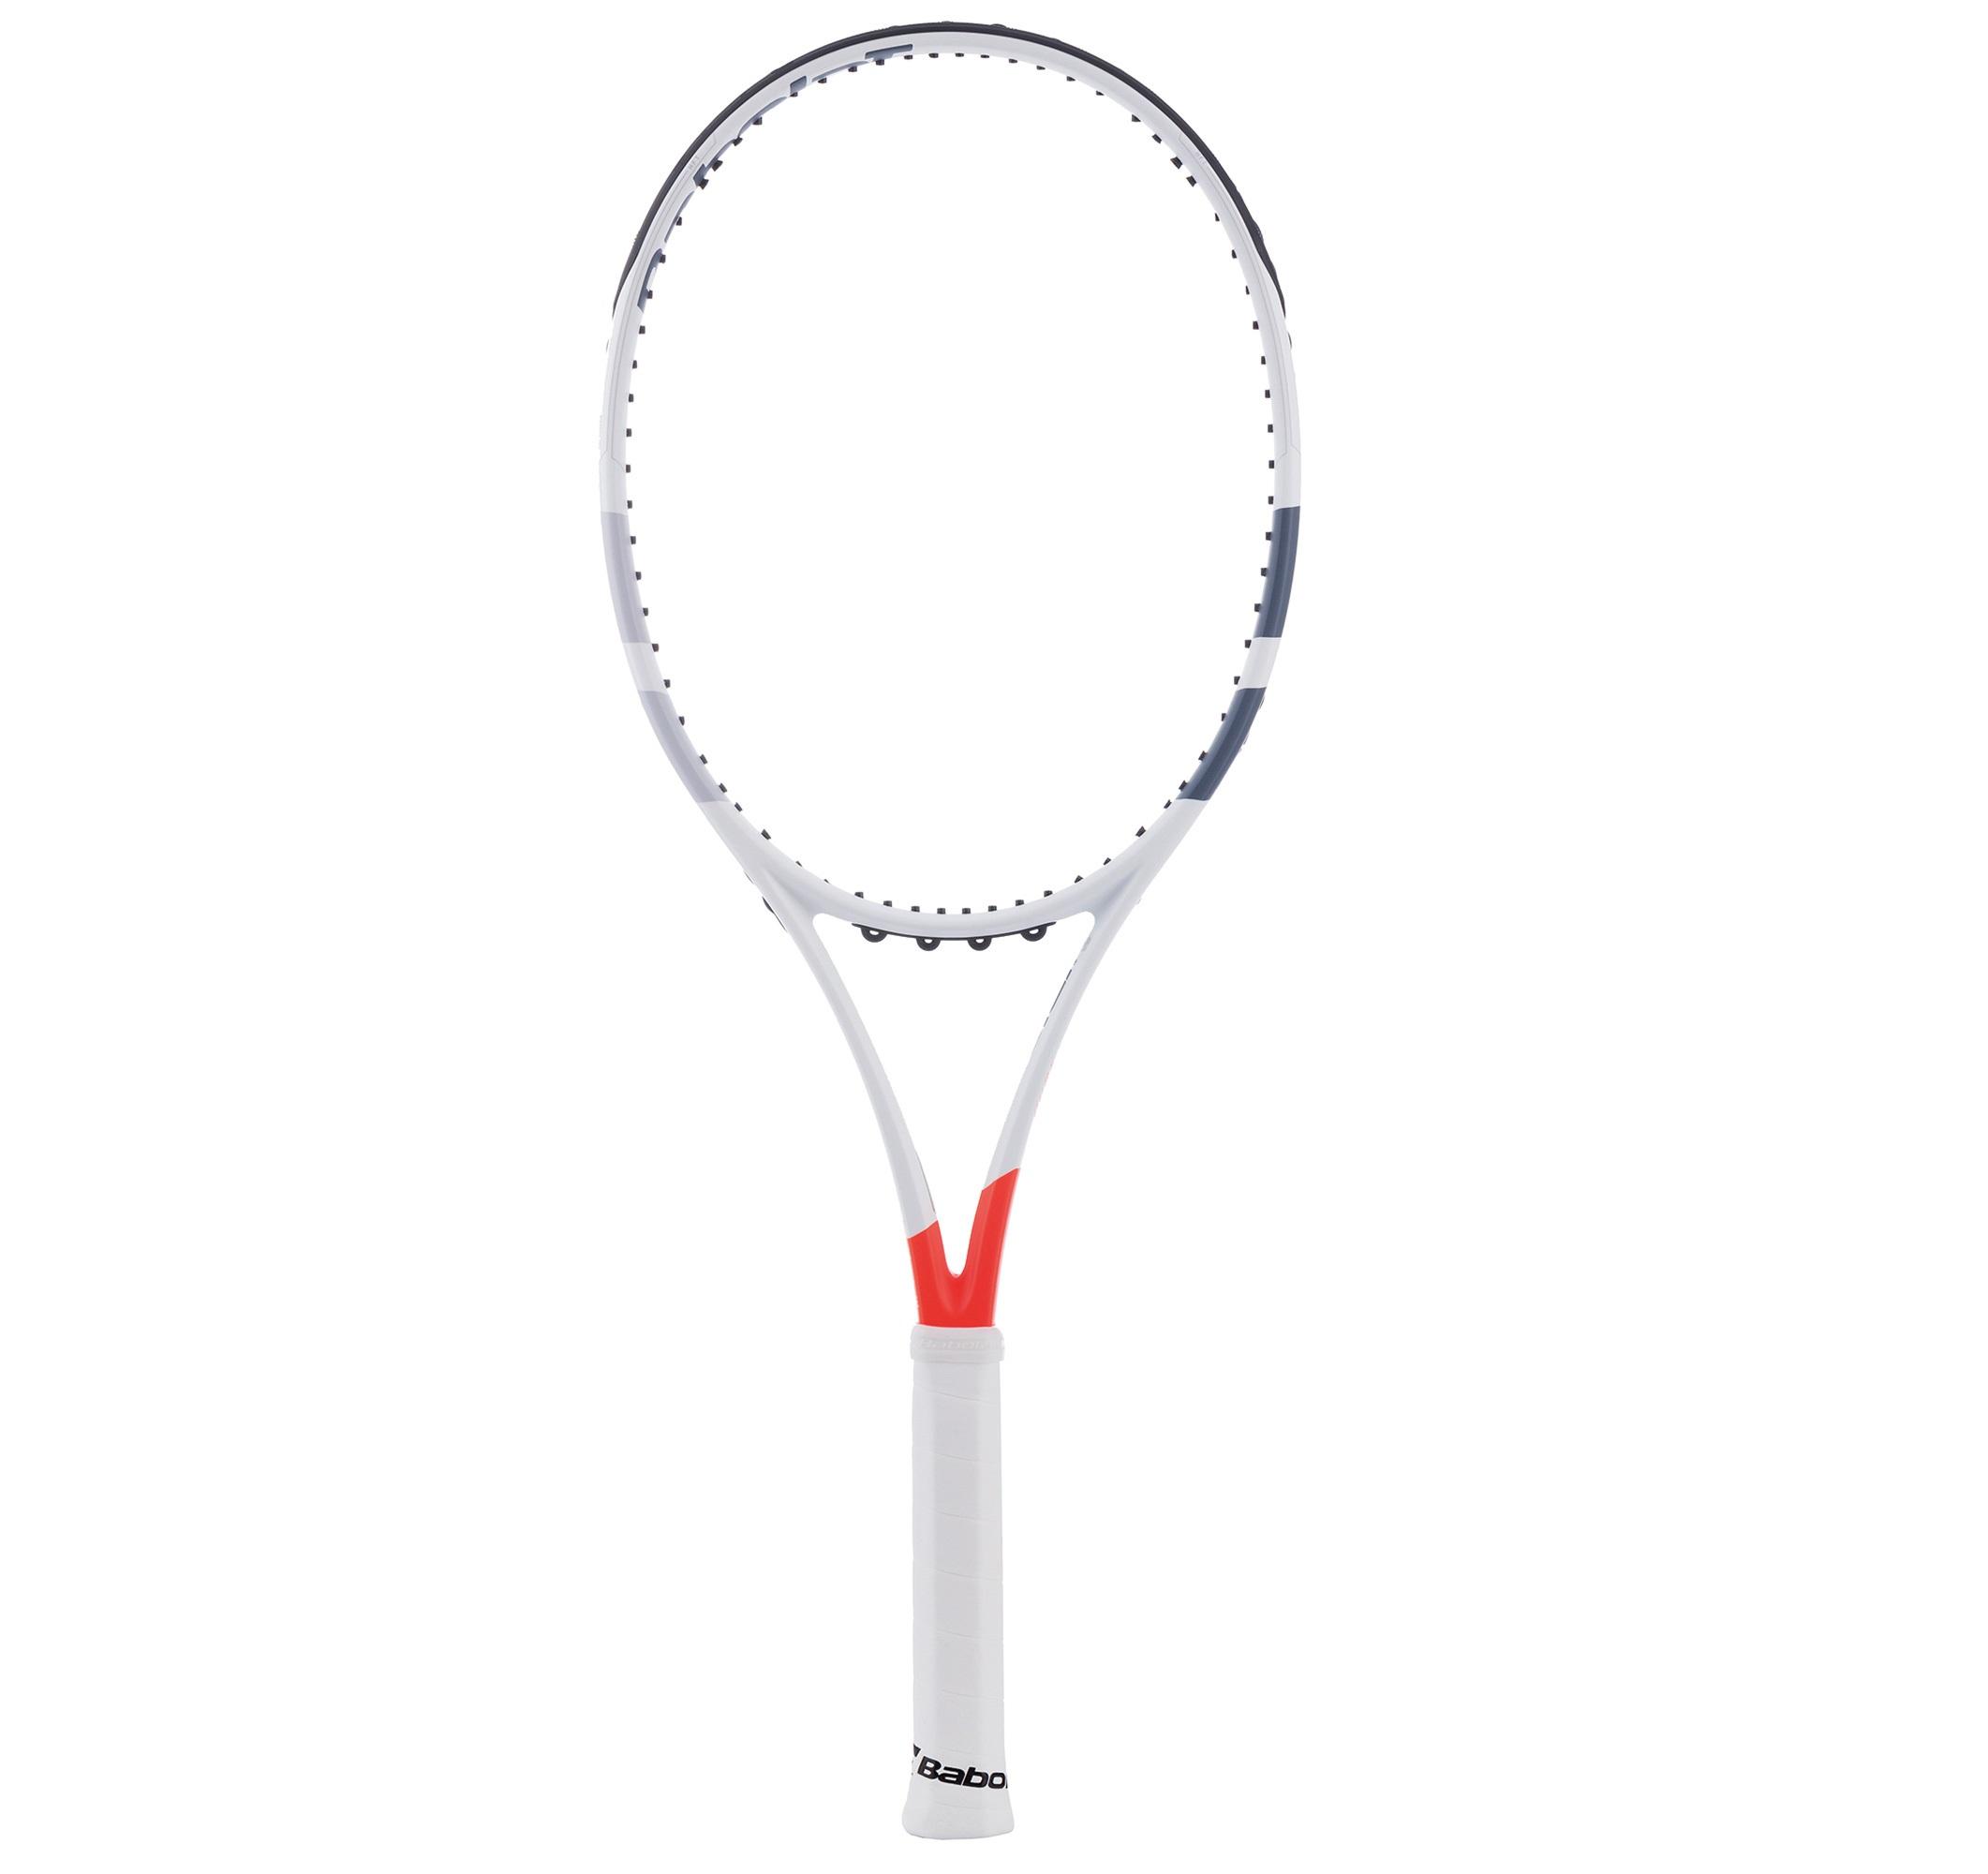 Babolat Ракетка для большого тенниса Babolat Pure Strike 16X19 Unstrung, размер 3 babolat ракетка для большого тенниса детская babolat ballfighter 19 размер без размера